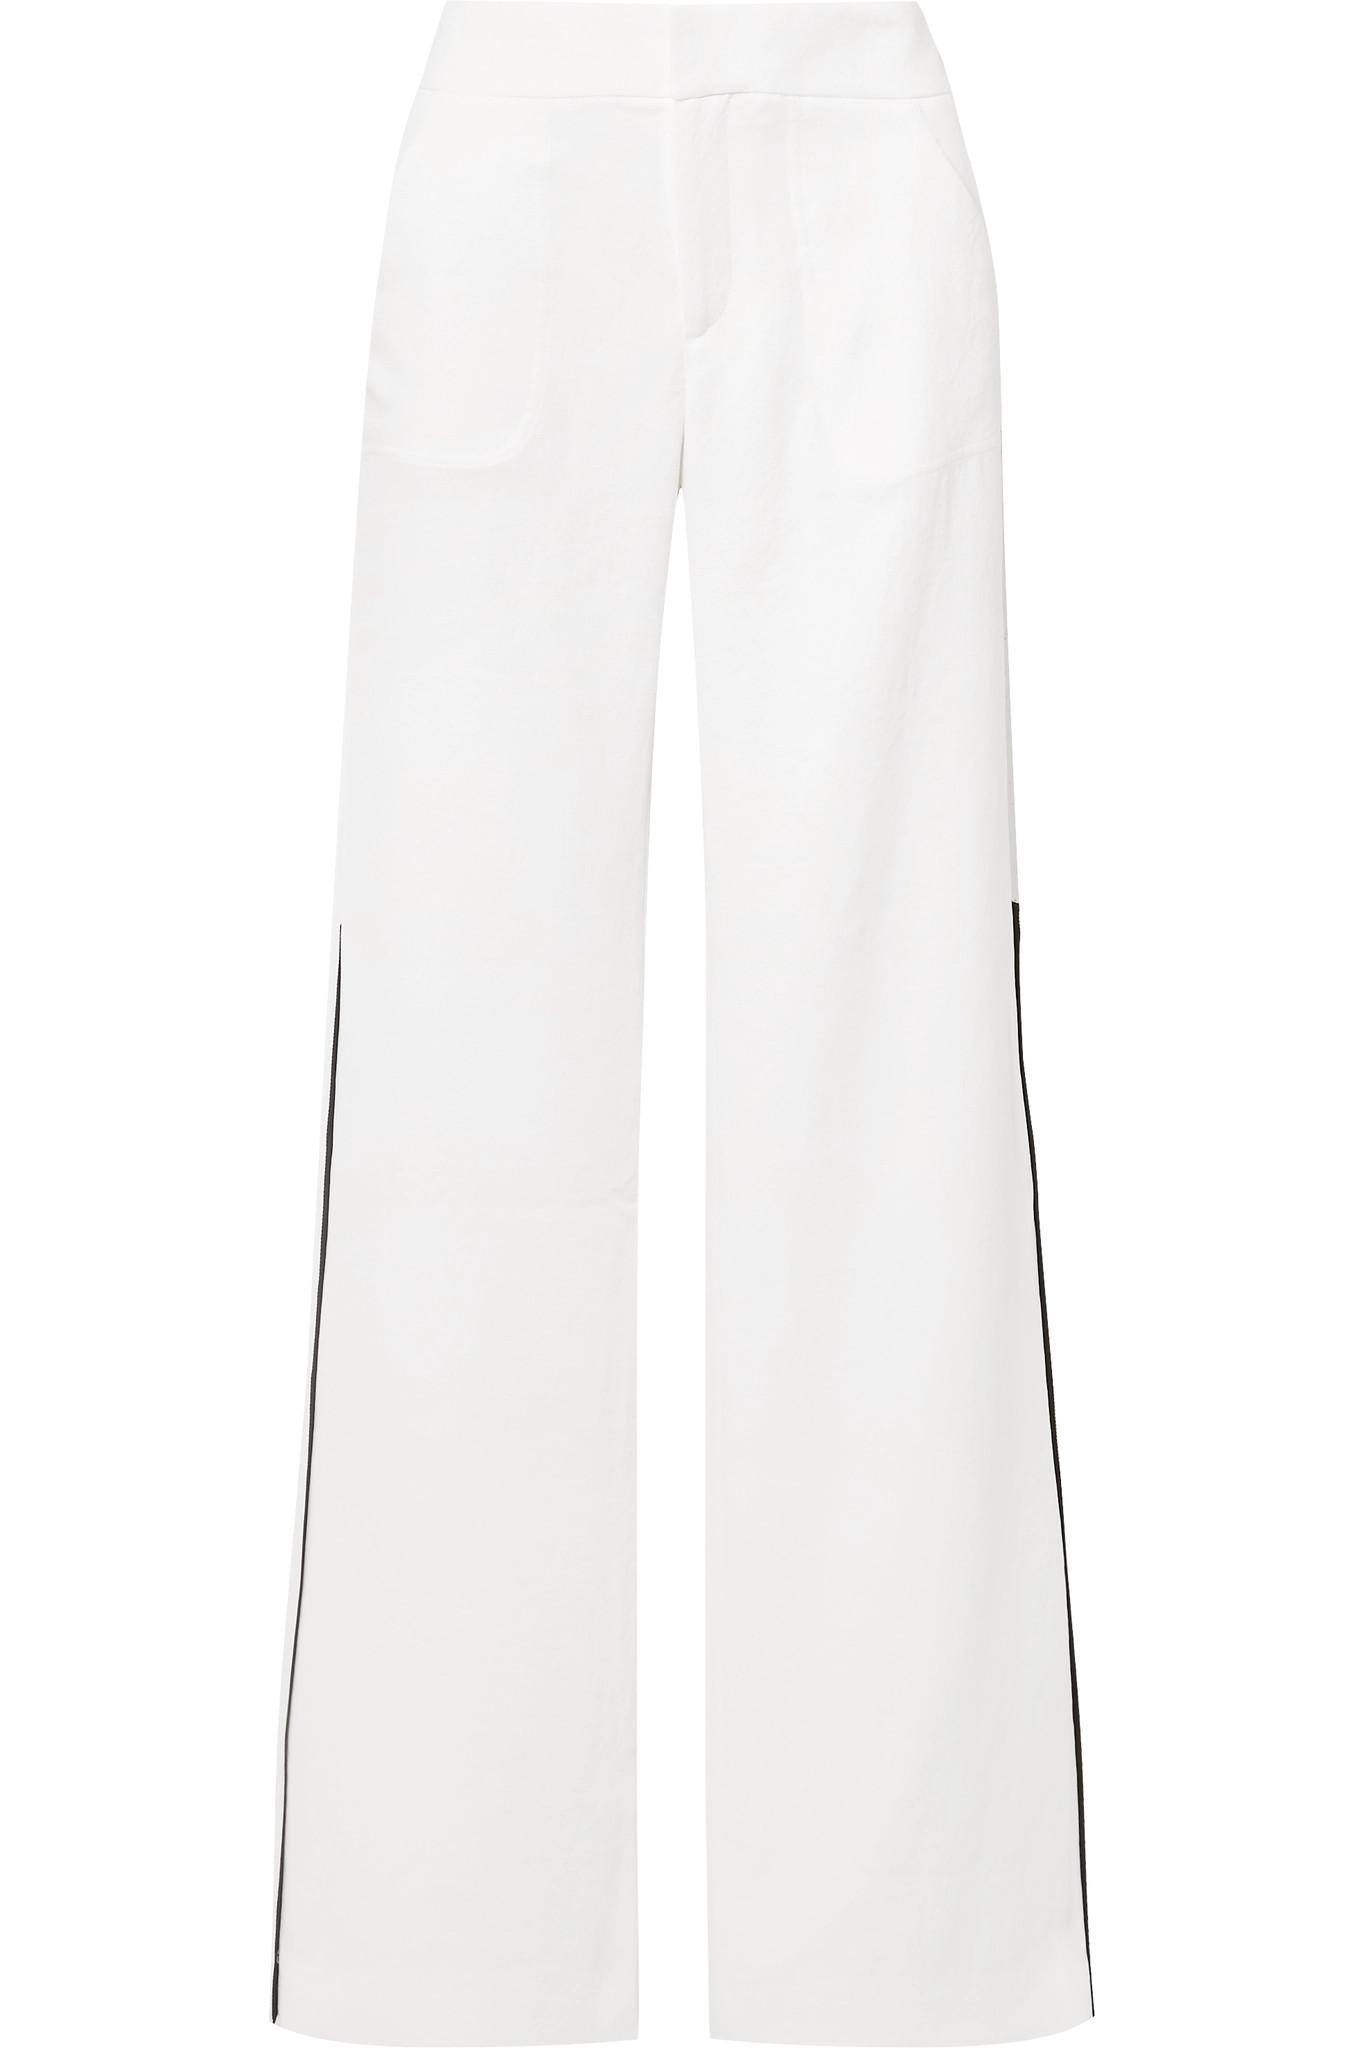 Saint jeans Silvia white